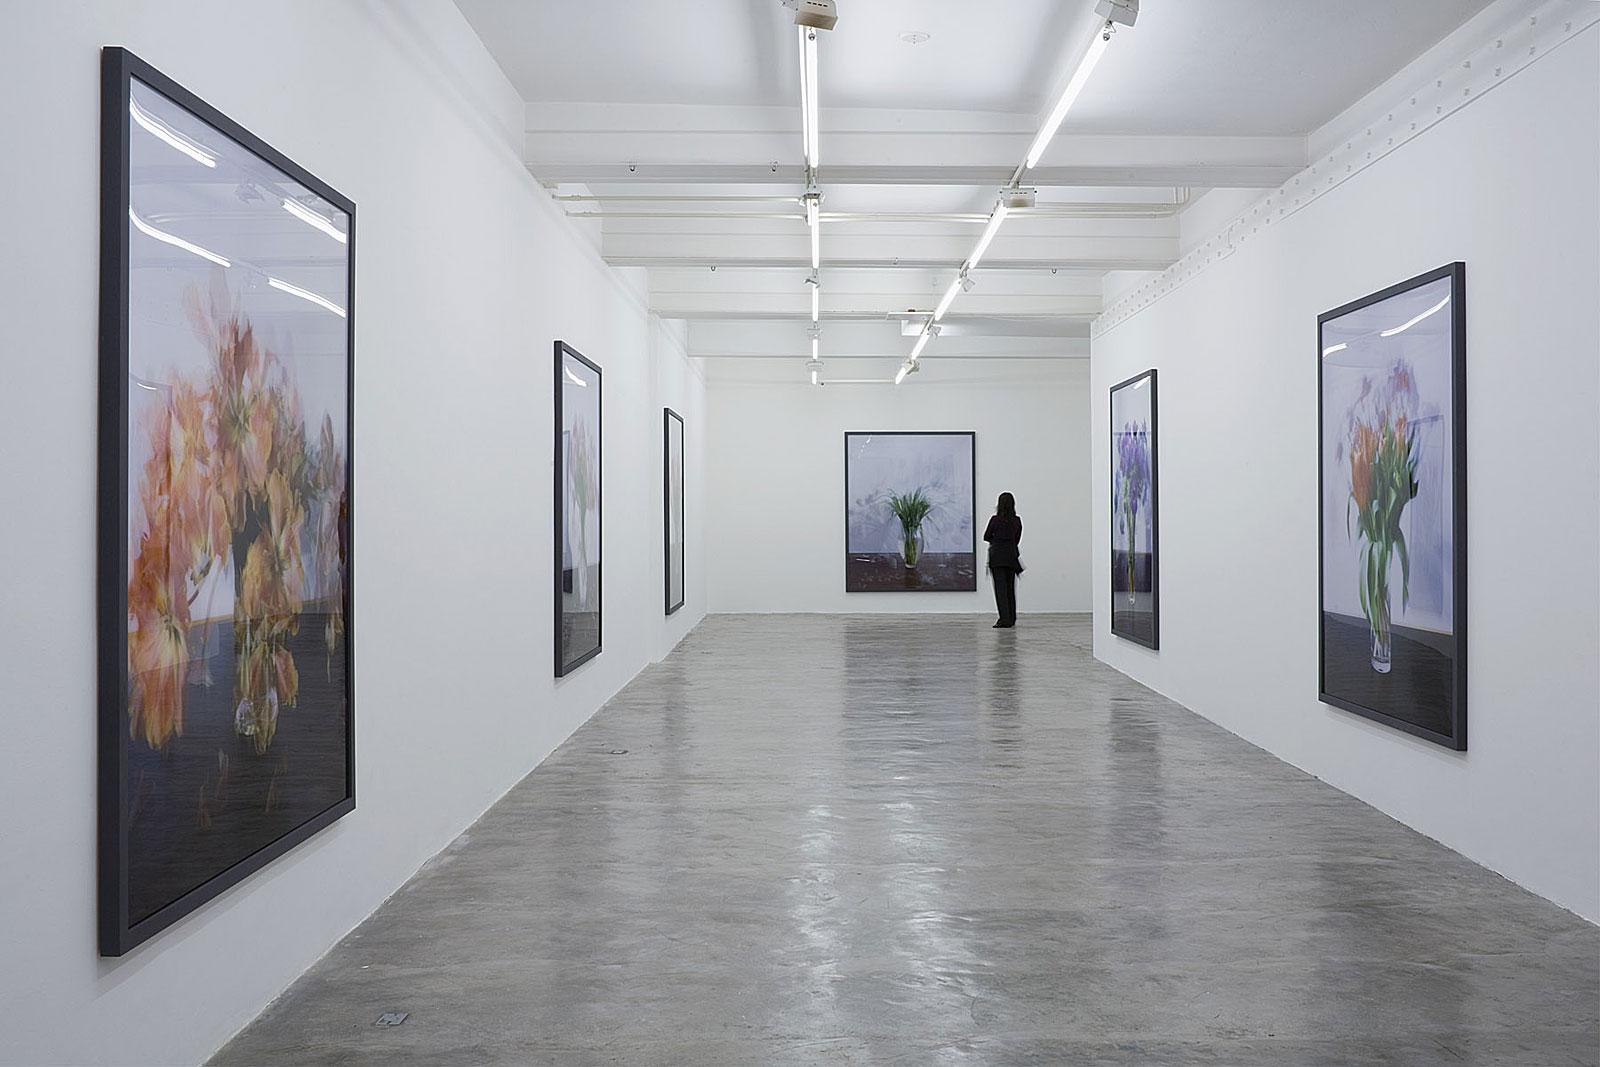 Stil Life, Galeria Baró Cruz, São Paulo